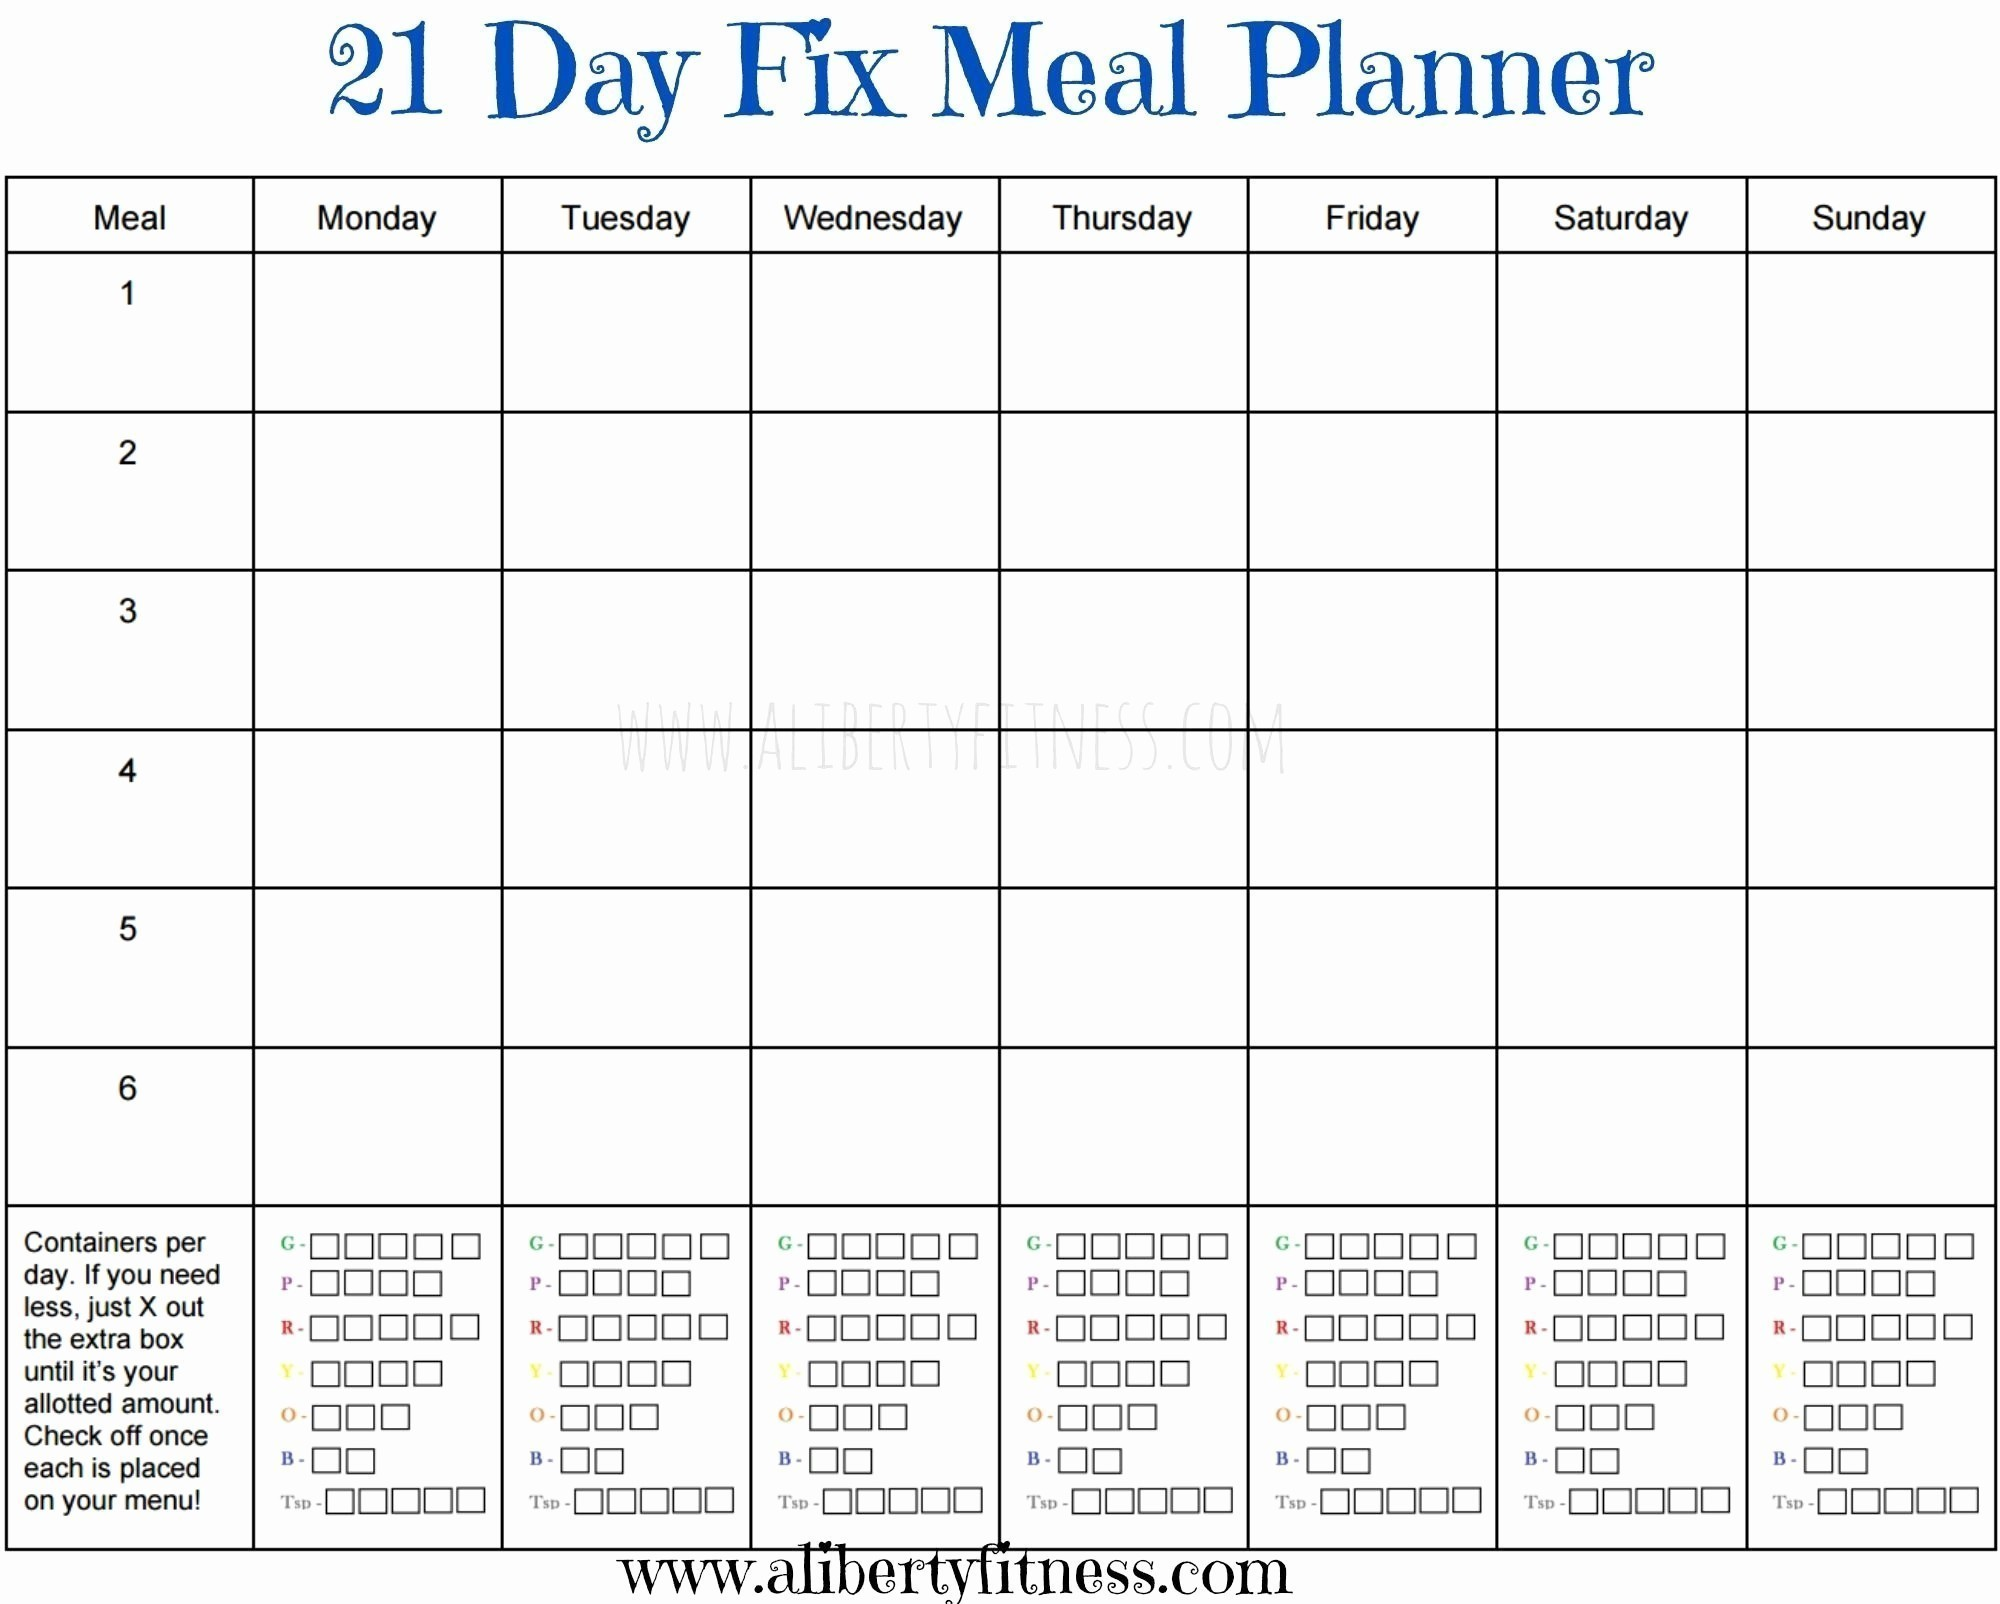 April 2019 Free Printable Calendar Printable Calendar 2019 18 Free Calendar Templates 2019 Page 28